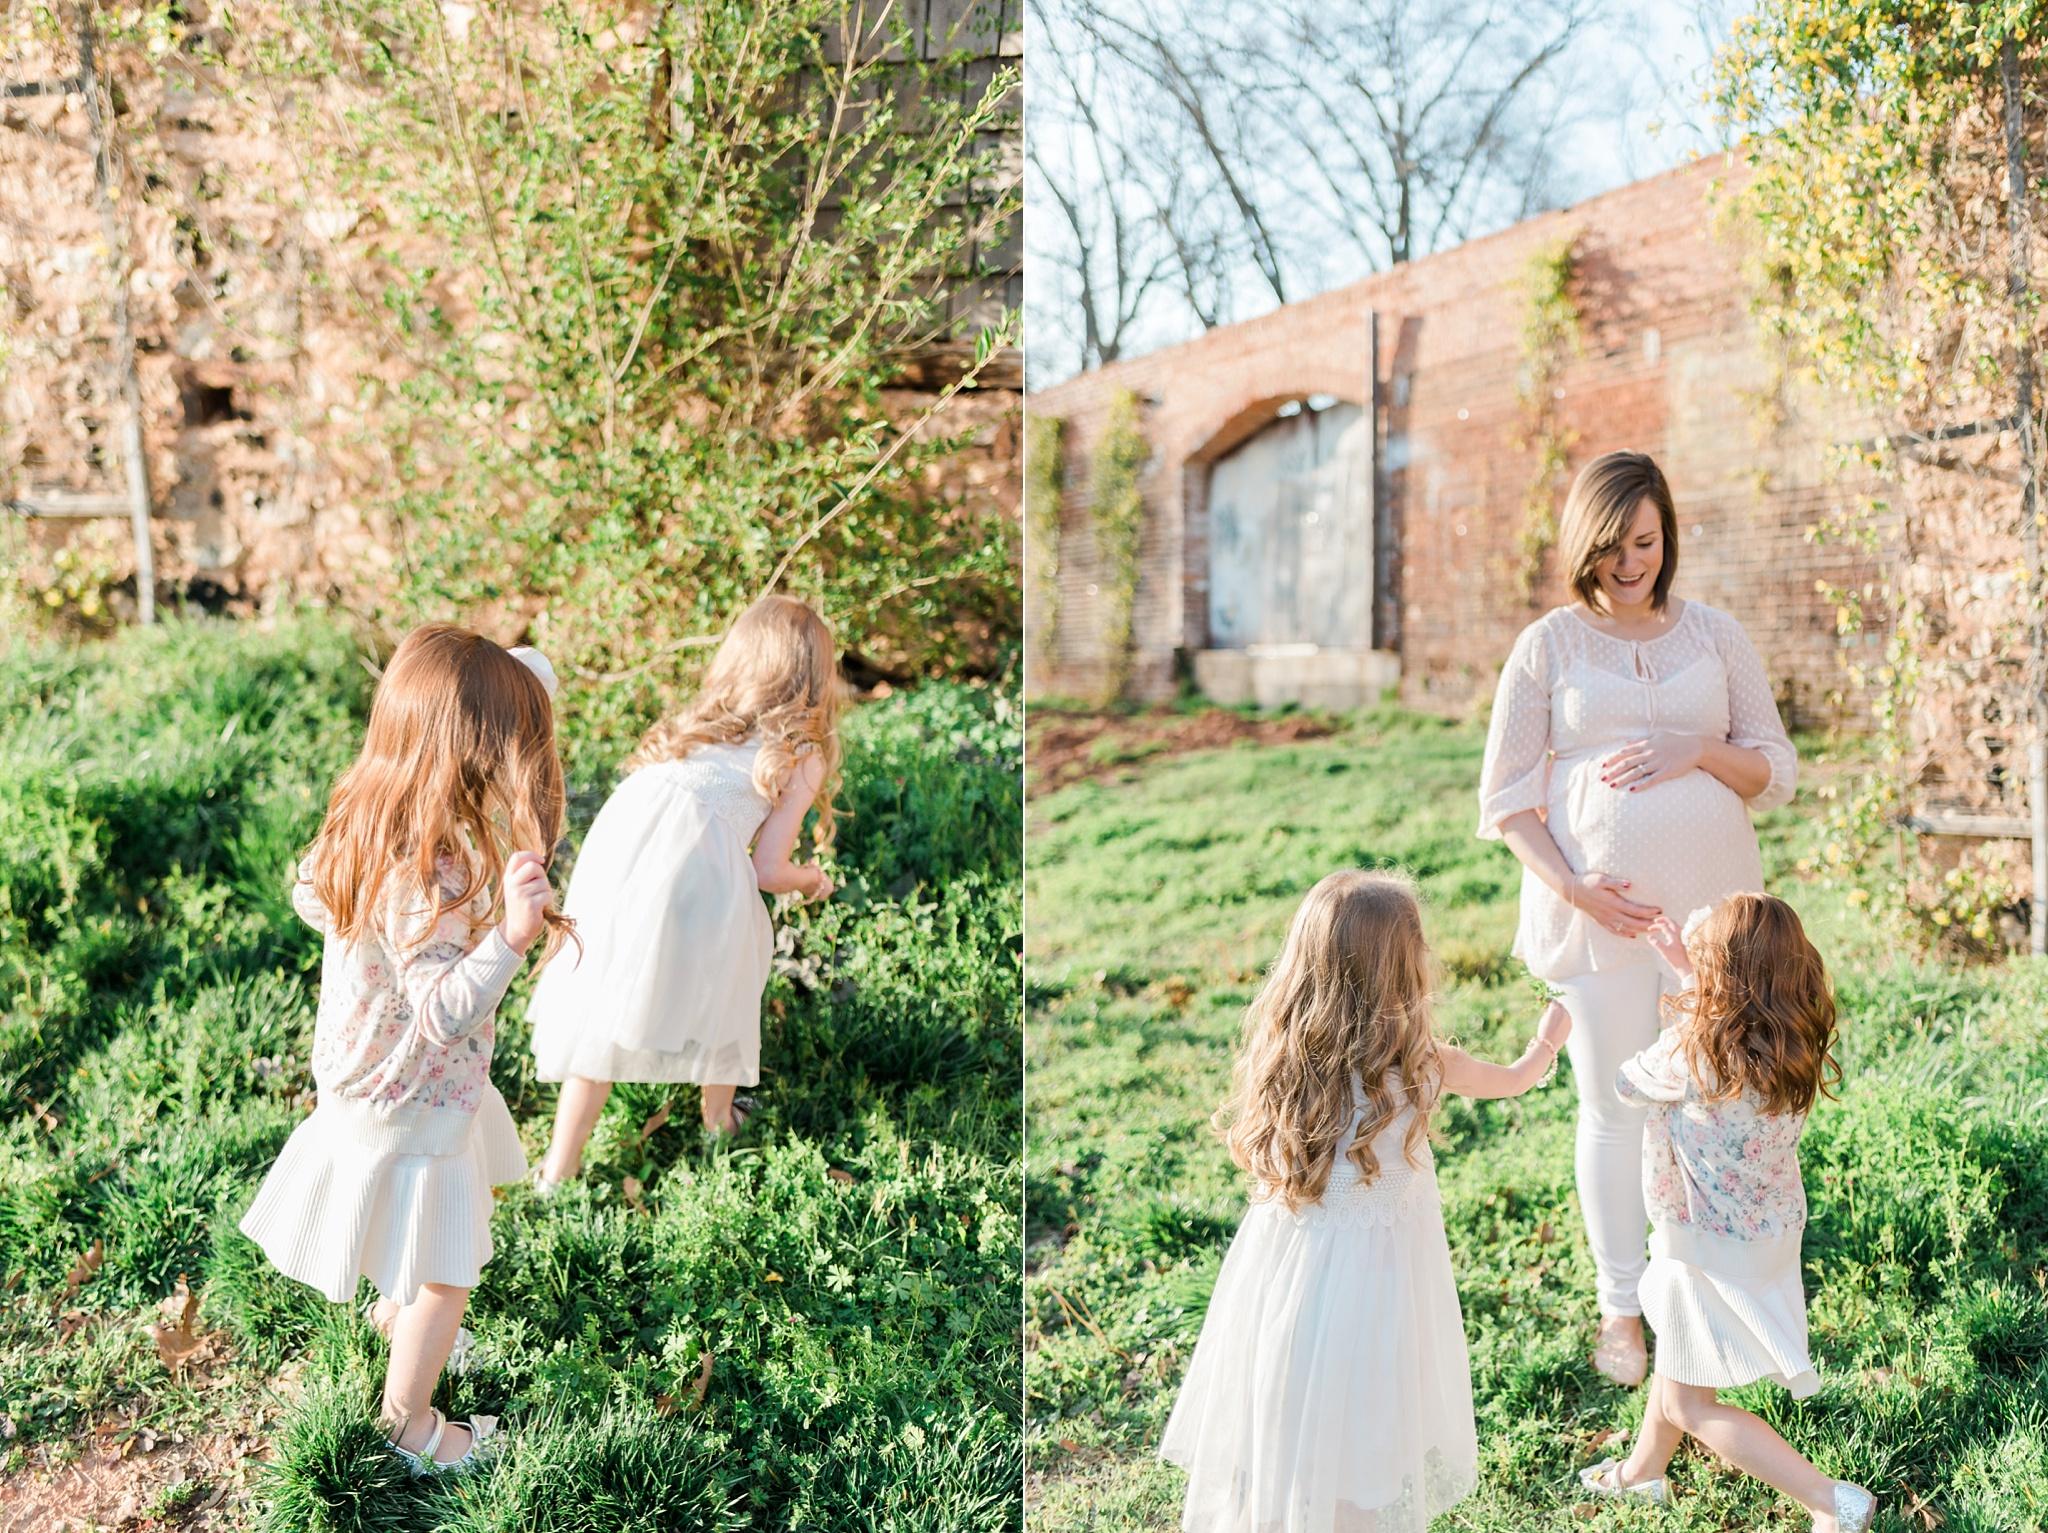 senoia-georgia-maternity-motherhood-photographer-moorebaby3-29.jpg